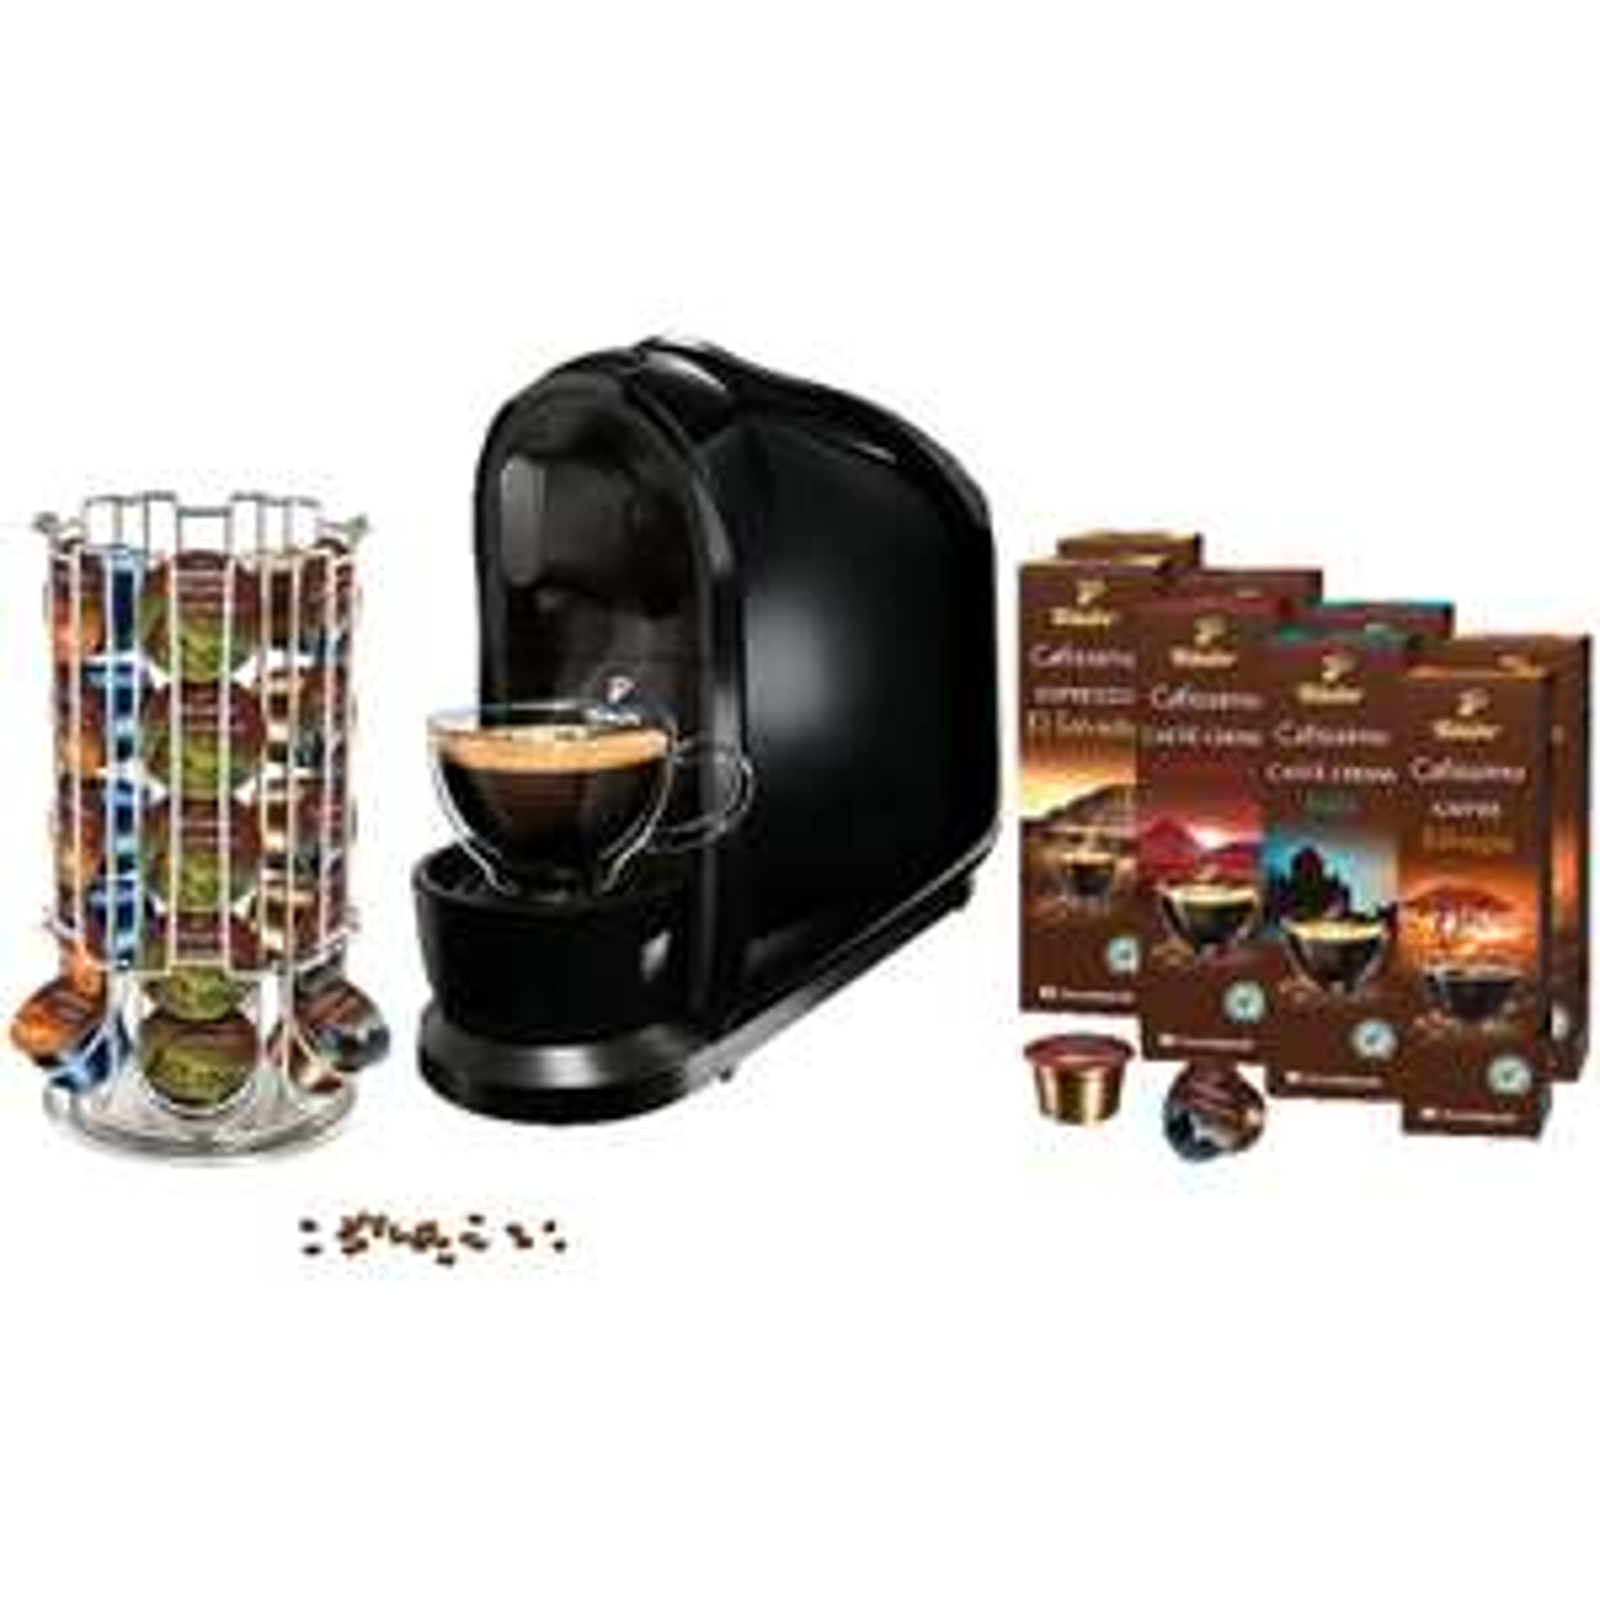 [ebay/MM] TCHIBO CAFISSIMO Pure Schwarz inkl. 80 Kapseln und Kapselspender Kapselmaschine